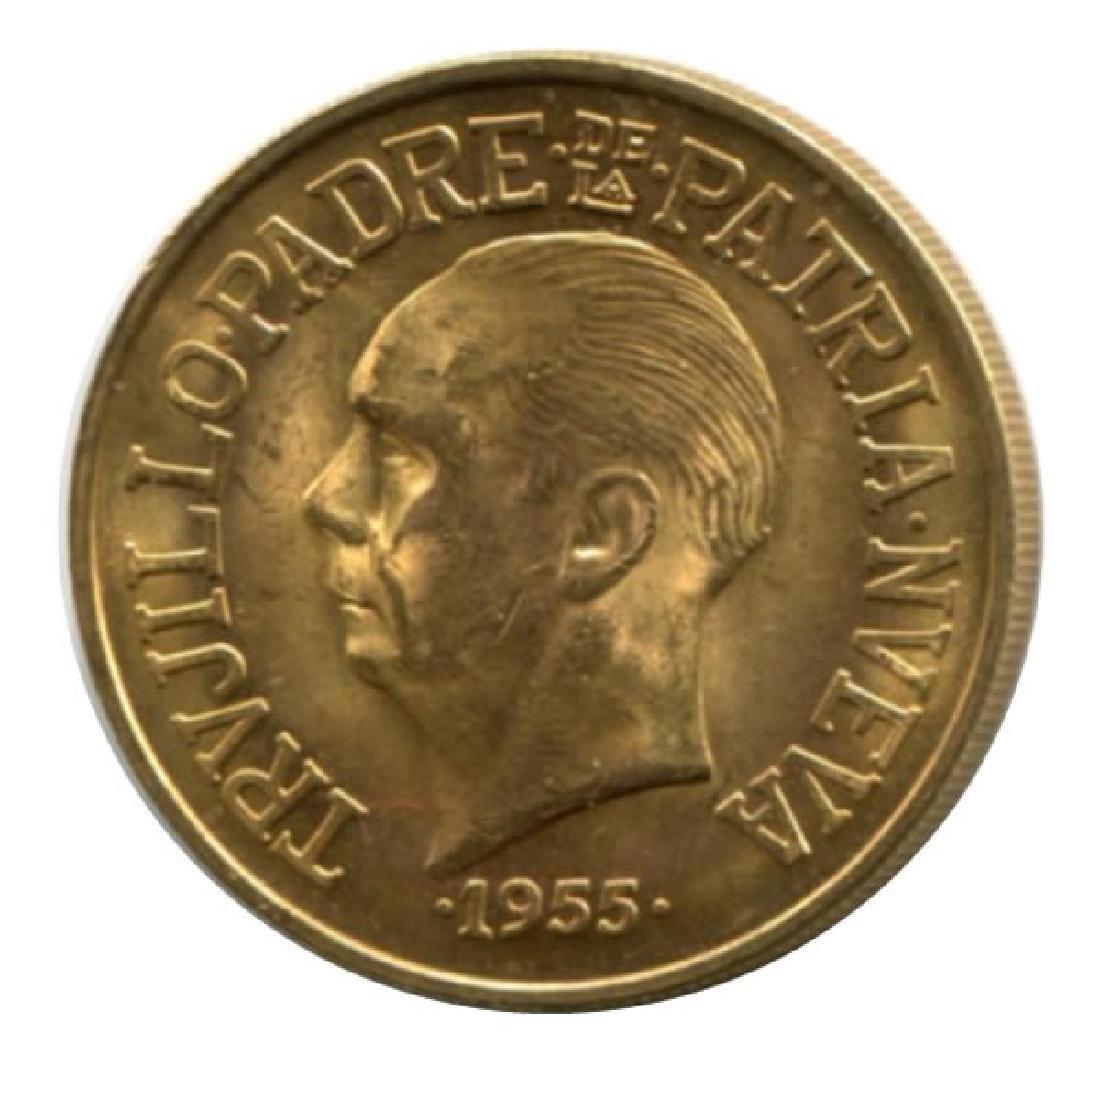 Dominican Republic 30 pesos gold 1955 Trujillo